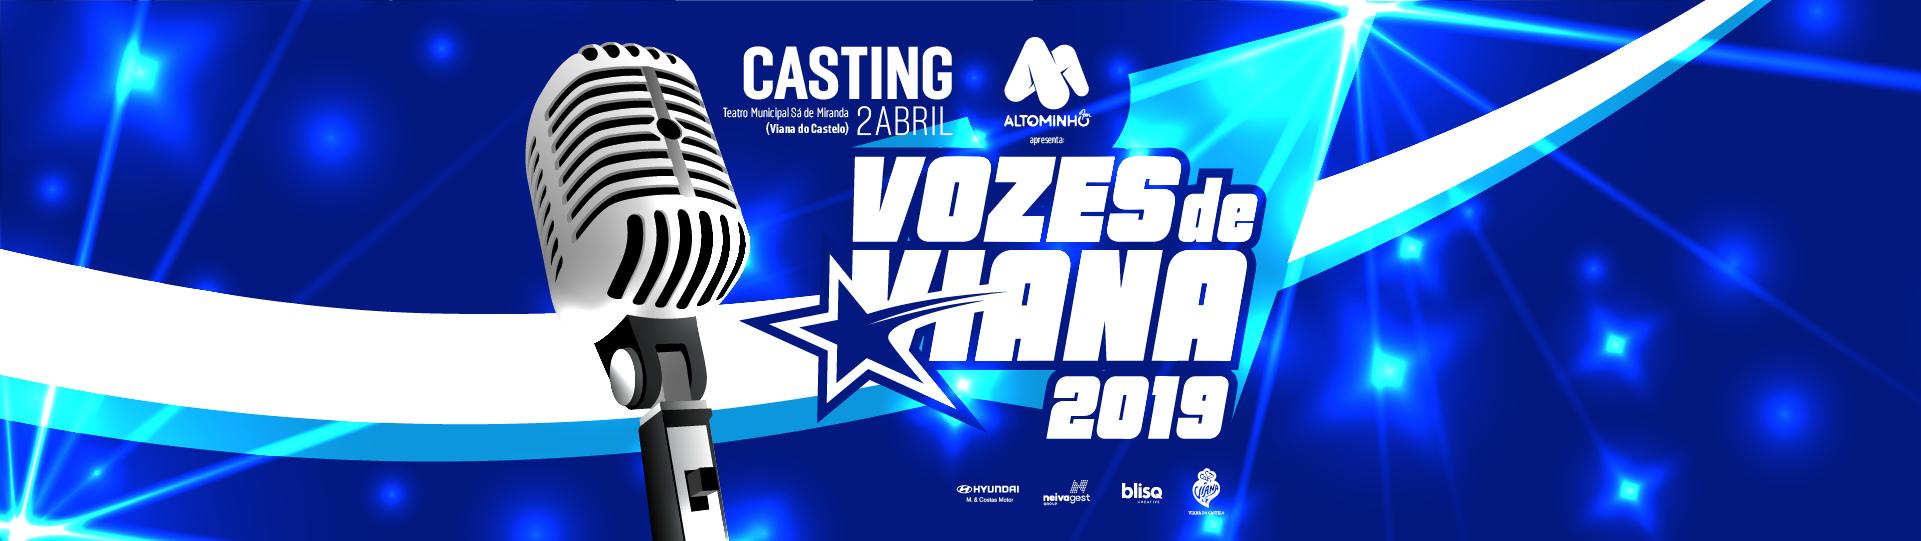 Vozes-de-Viana_2019_slider-site_V2-01